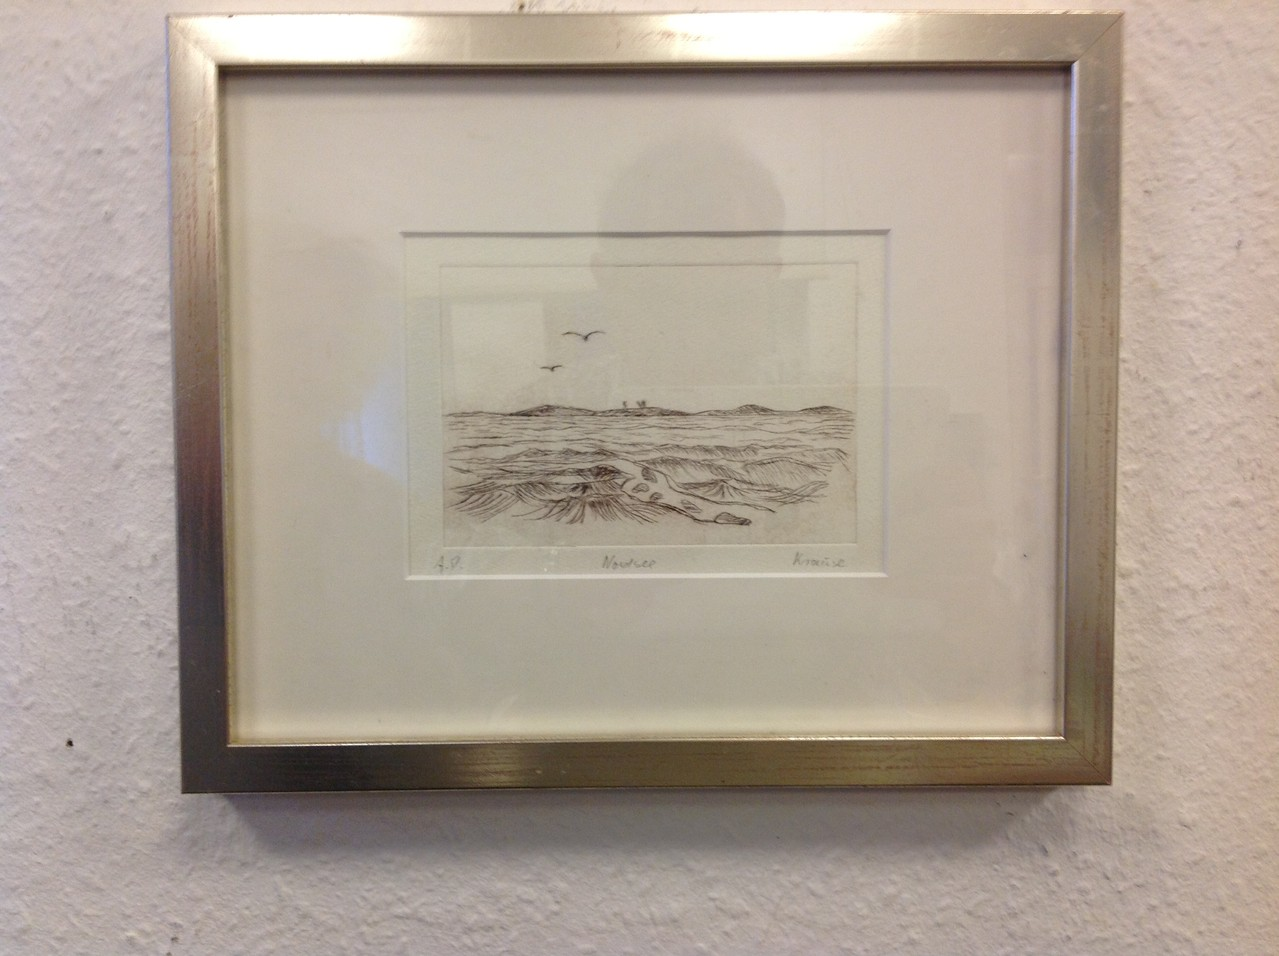 Dietmar Krause, Radierung, 20 x 30cm inkl. Rahmen